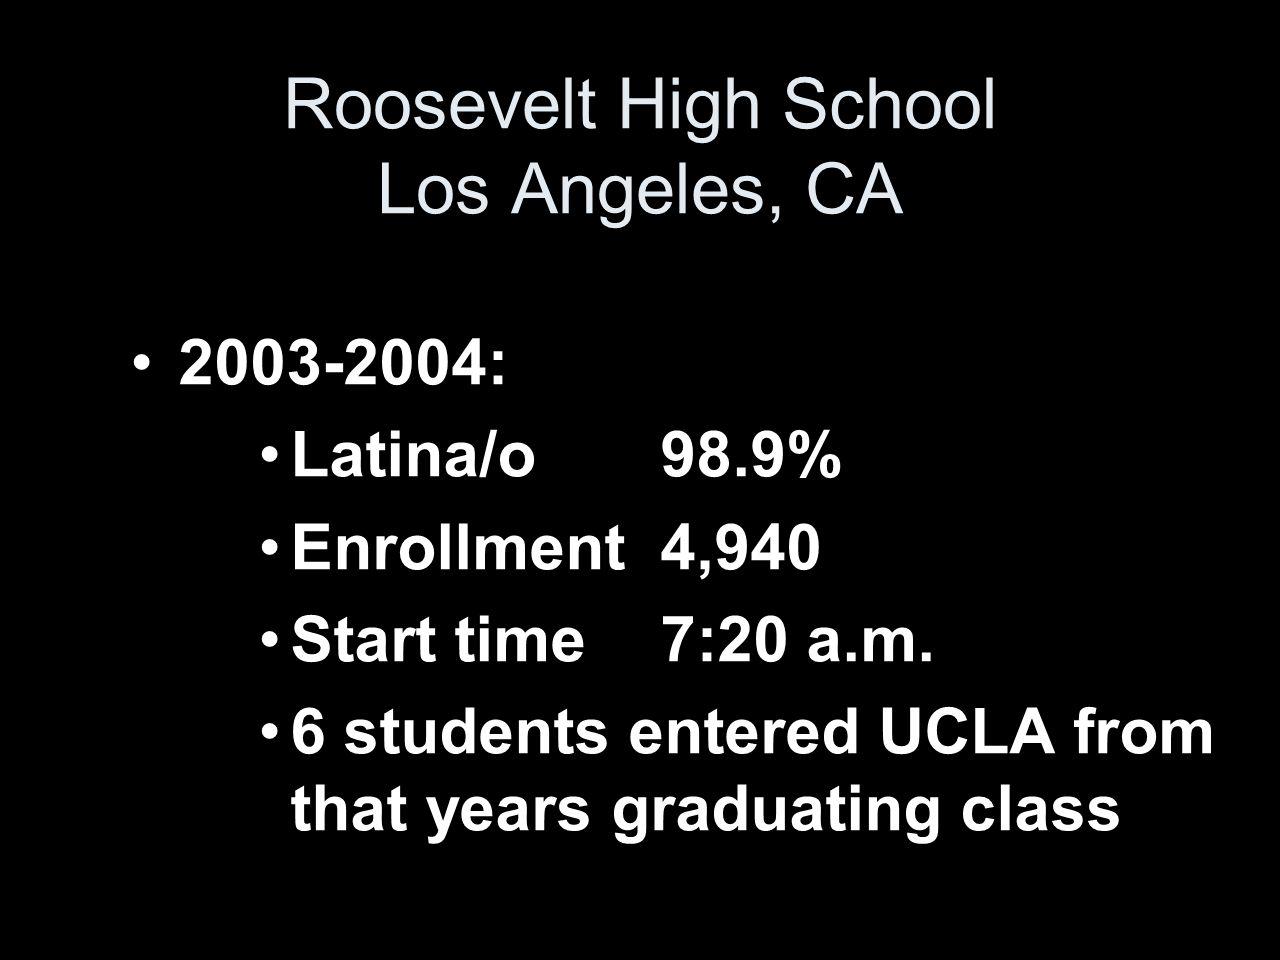 2003-2004: Latina/o 98.9% Enrollment 4,940 Start time 7:20 a.m.